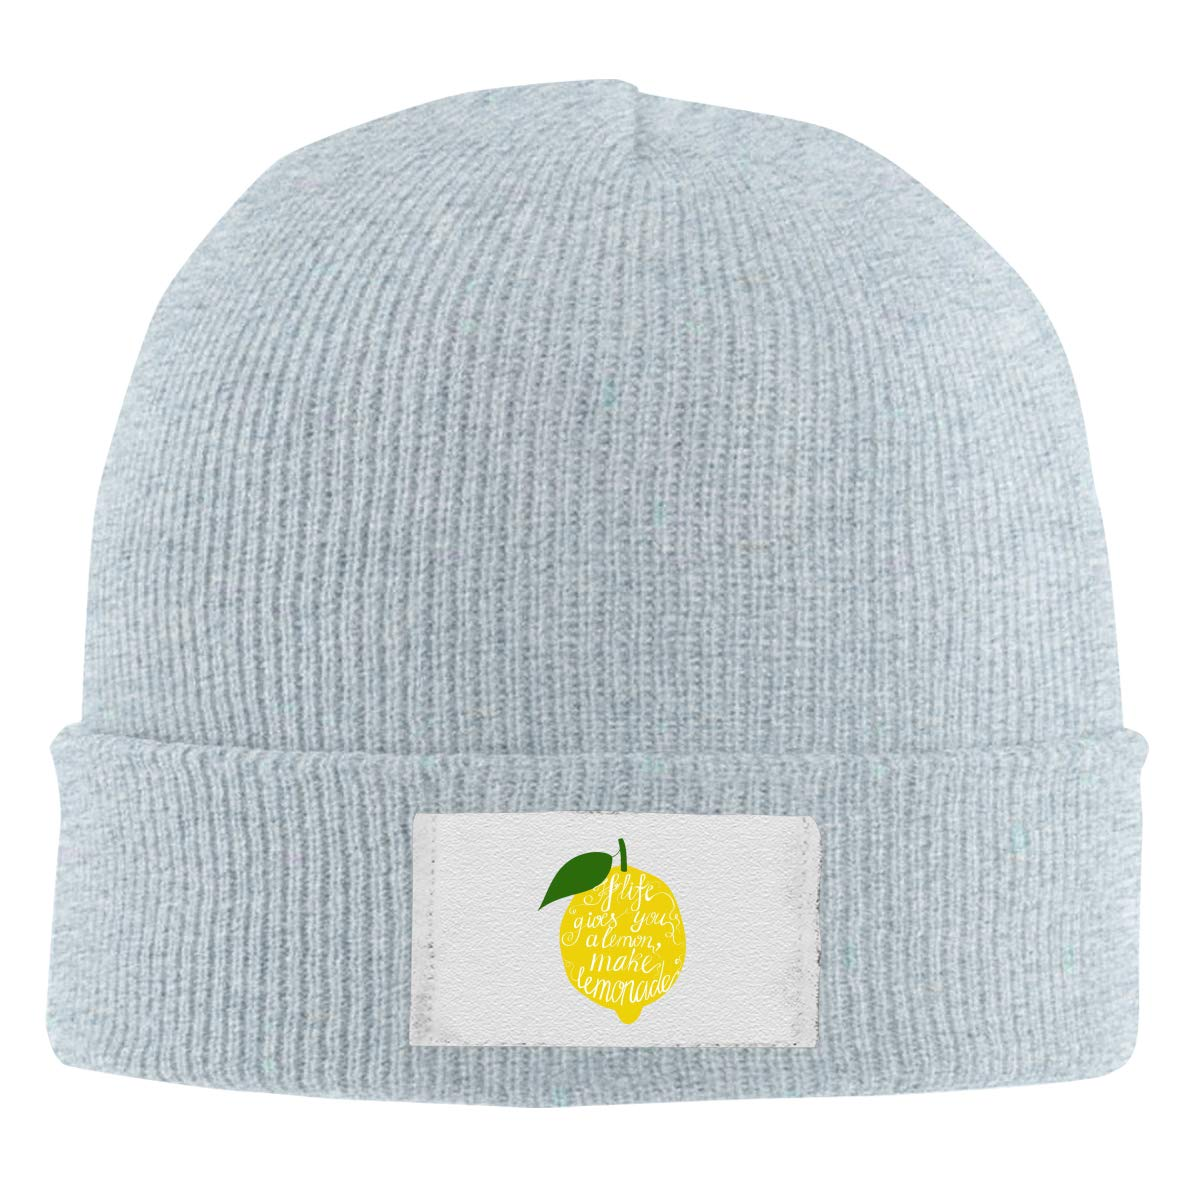 Stretchy Cuff Beanie Hat Black Dunpaiaa Skull Caps Gives You Lemons Make Lemonade Winter Warm Knit Hats